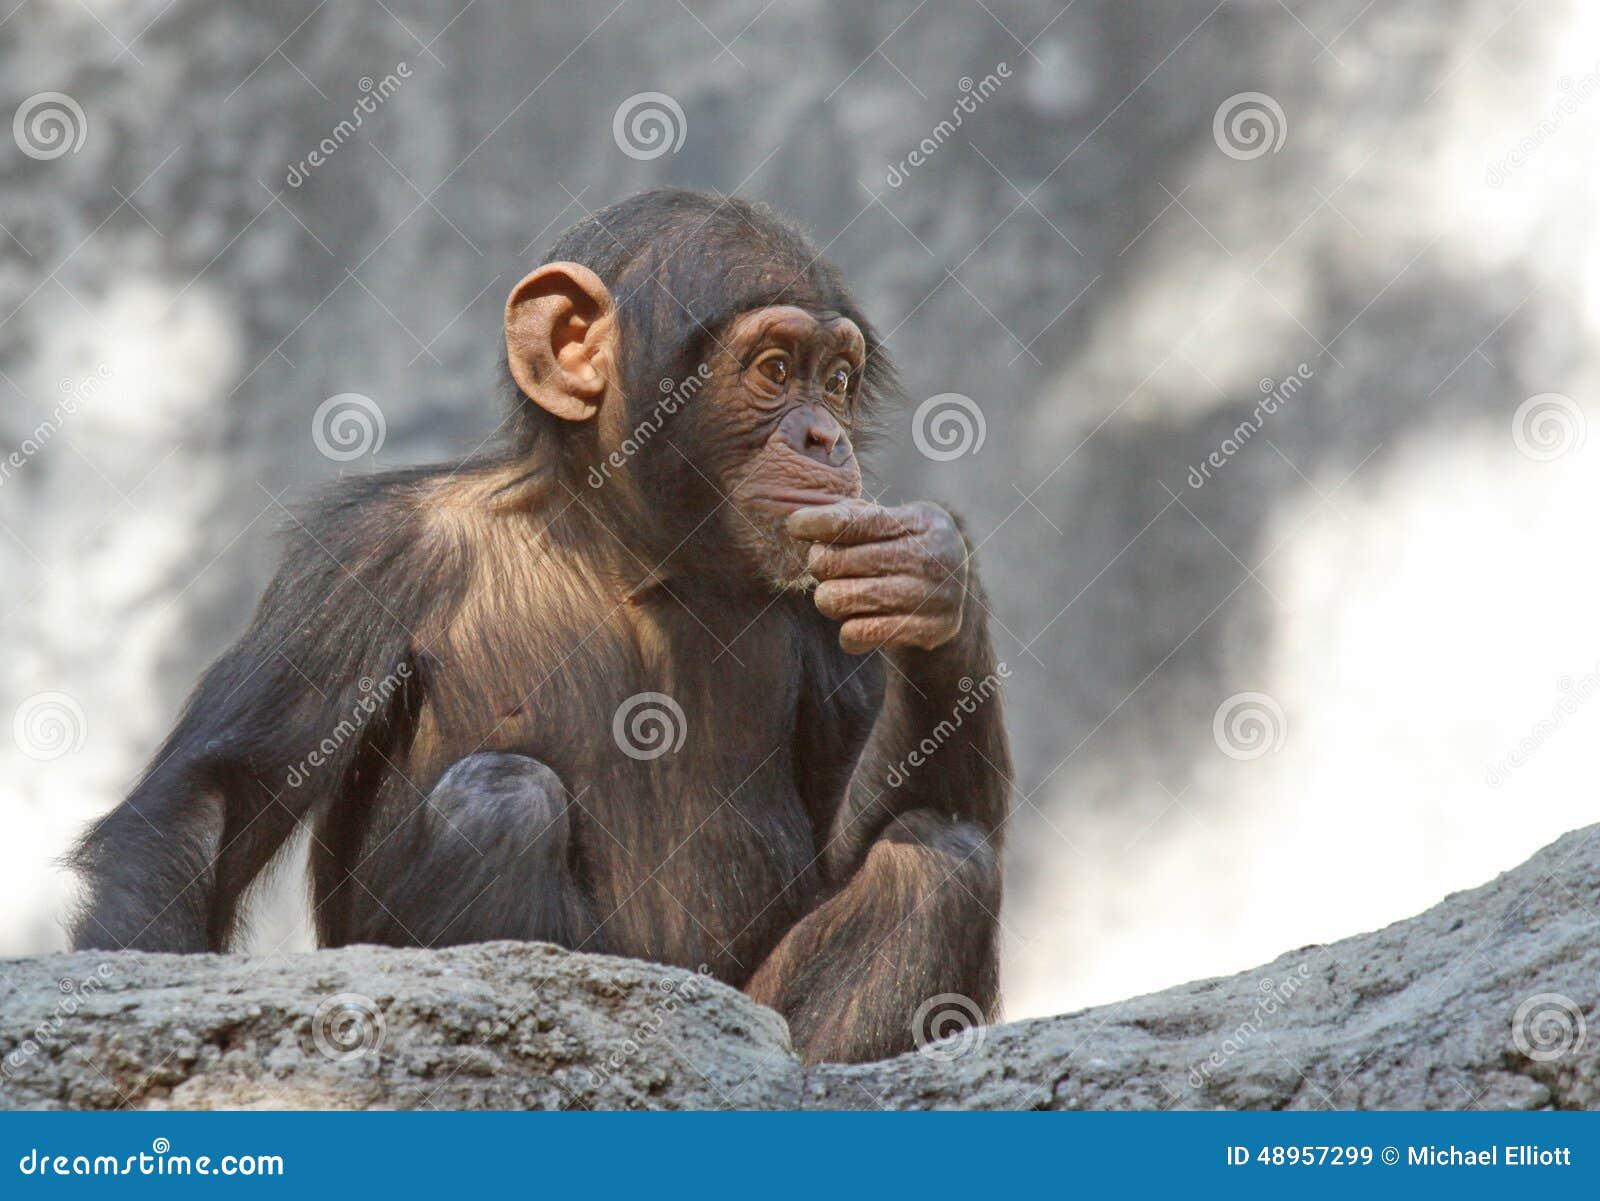 Chimpanzee (Pan Troglodytes) Sitting Stock Photography ...  |Chimp Sitting